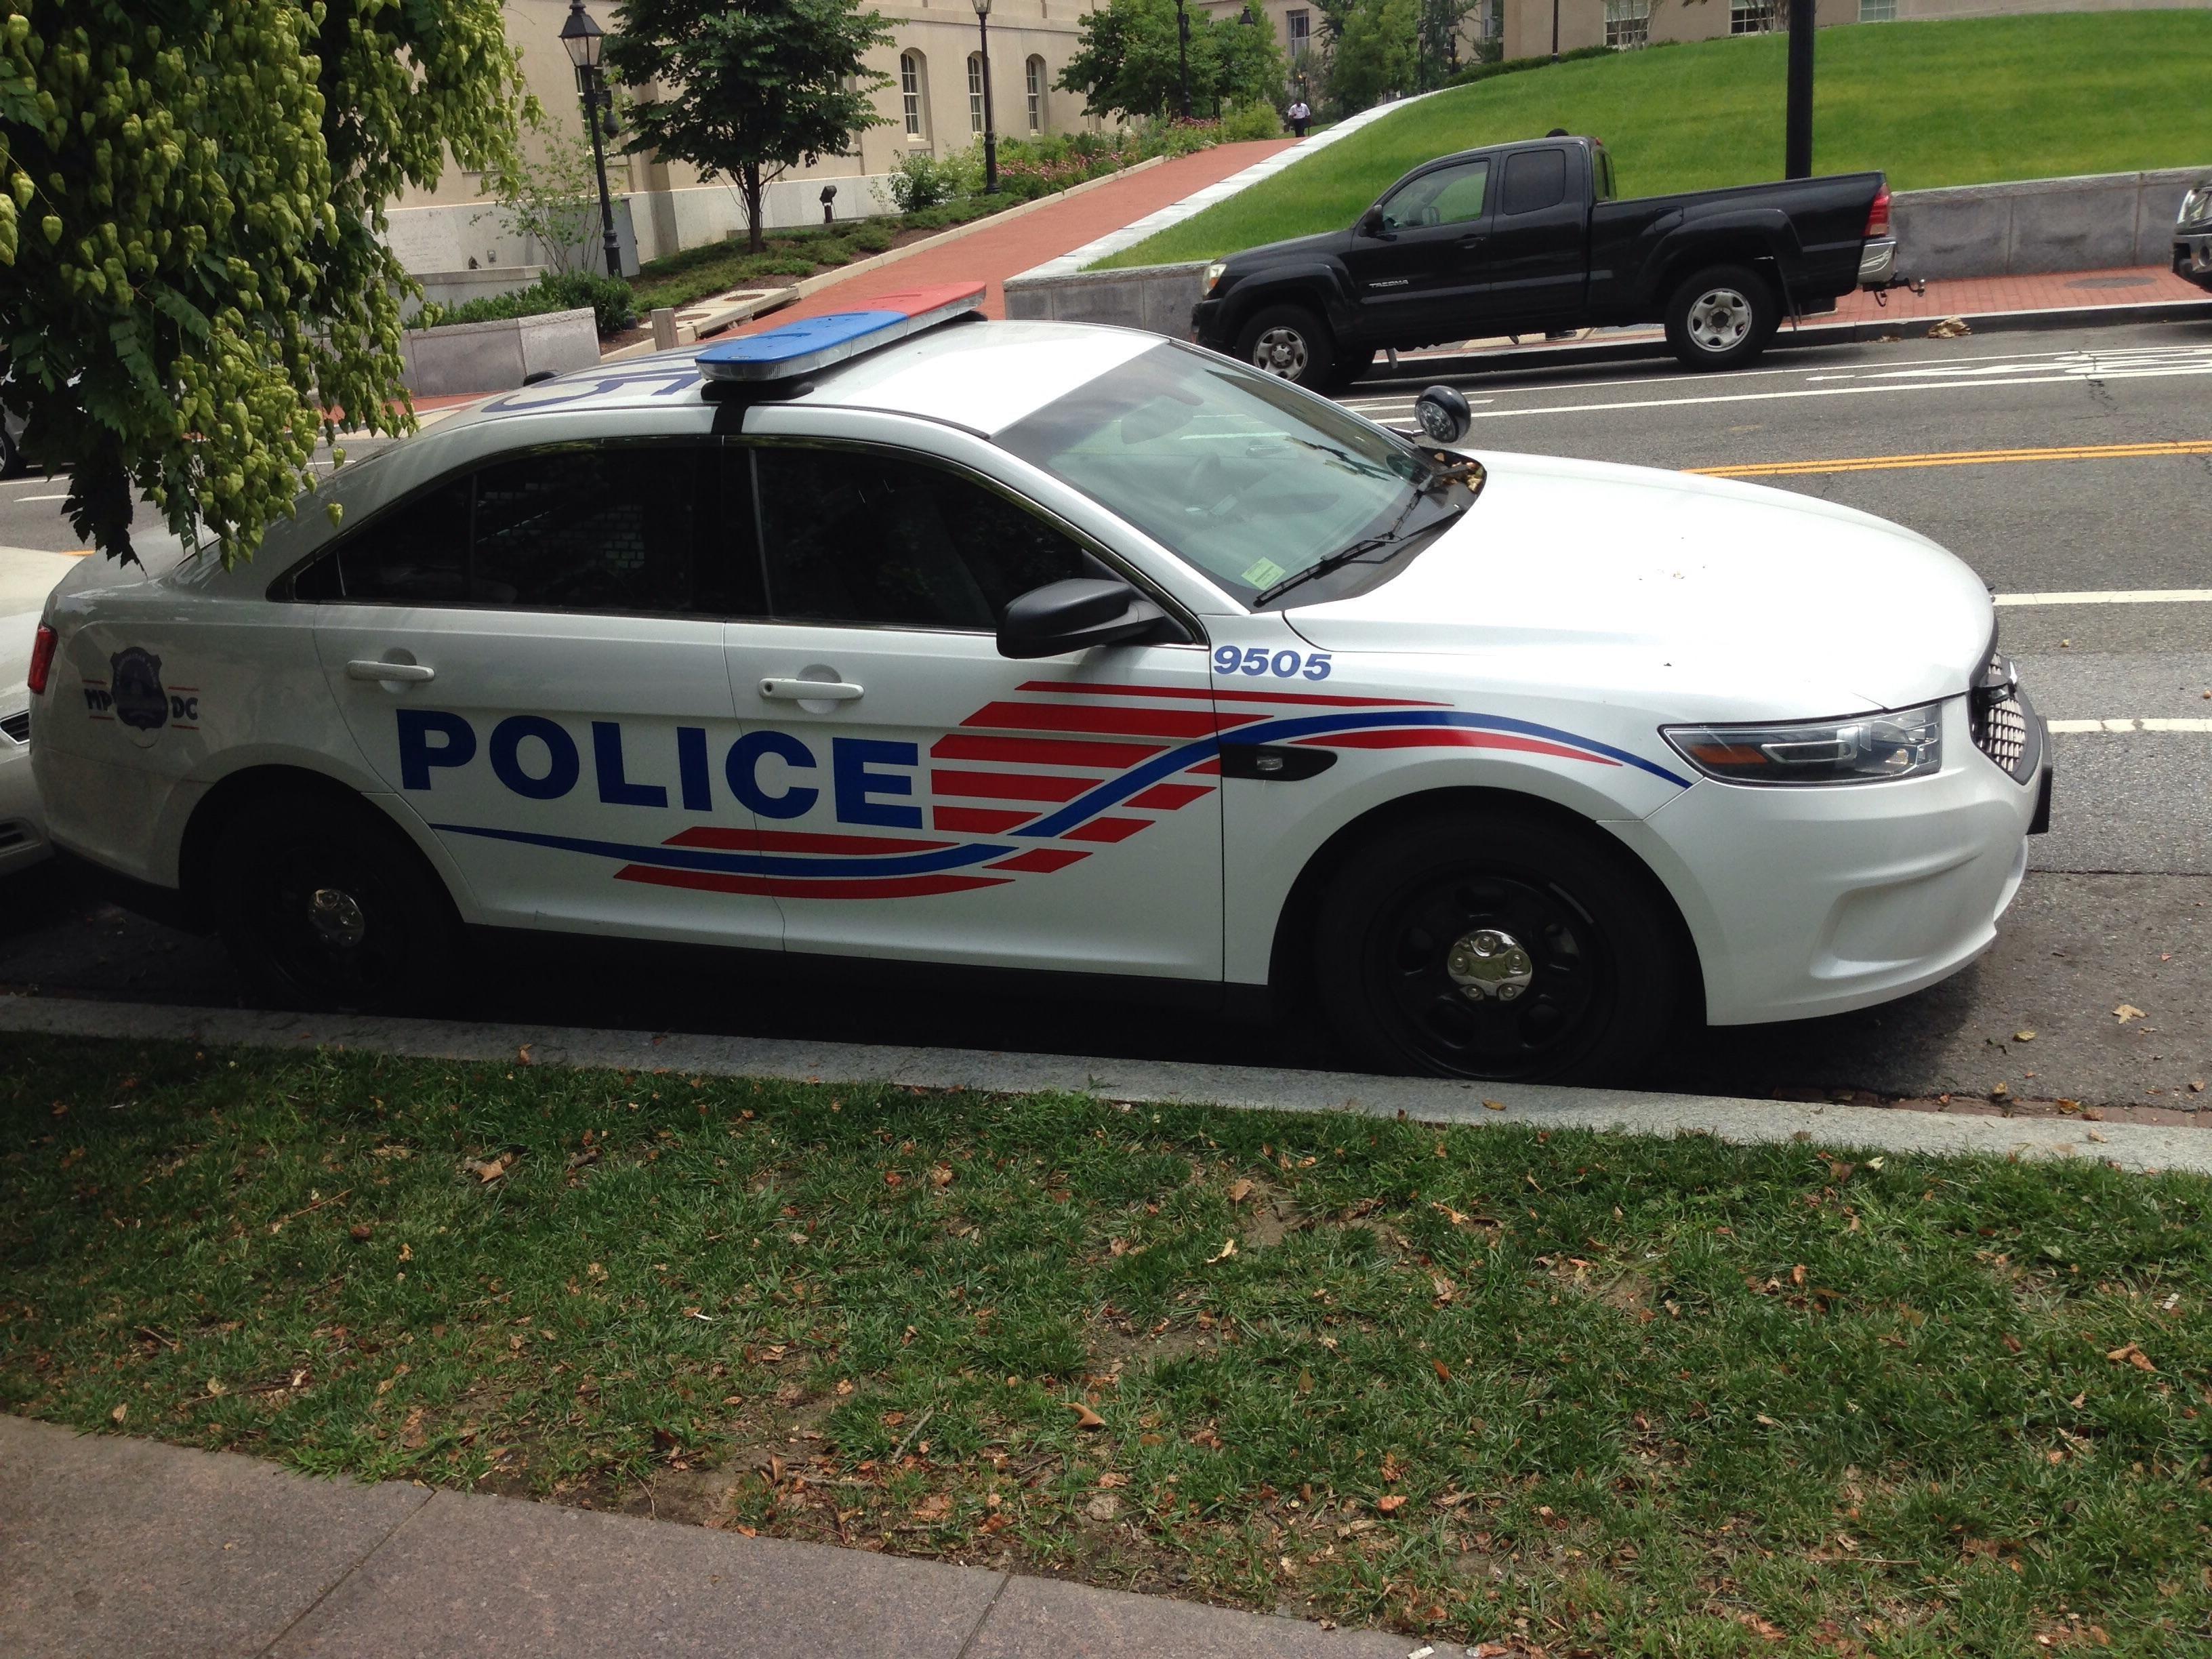 Metropolitan Police Department Ford Police Interceptor Dc Police Cars Police Ford Police